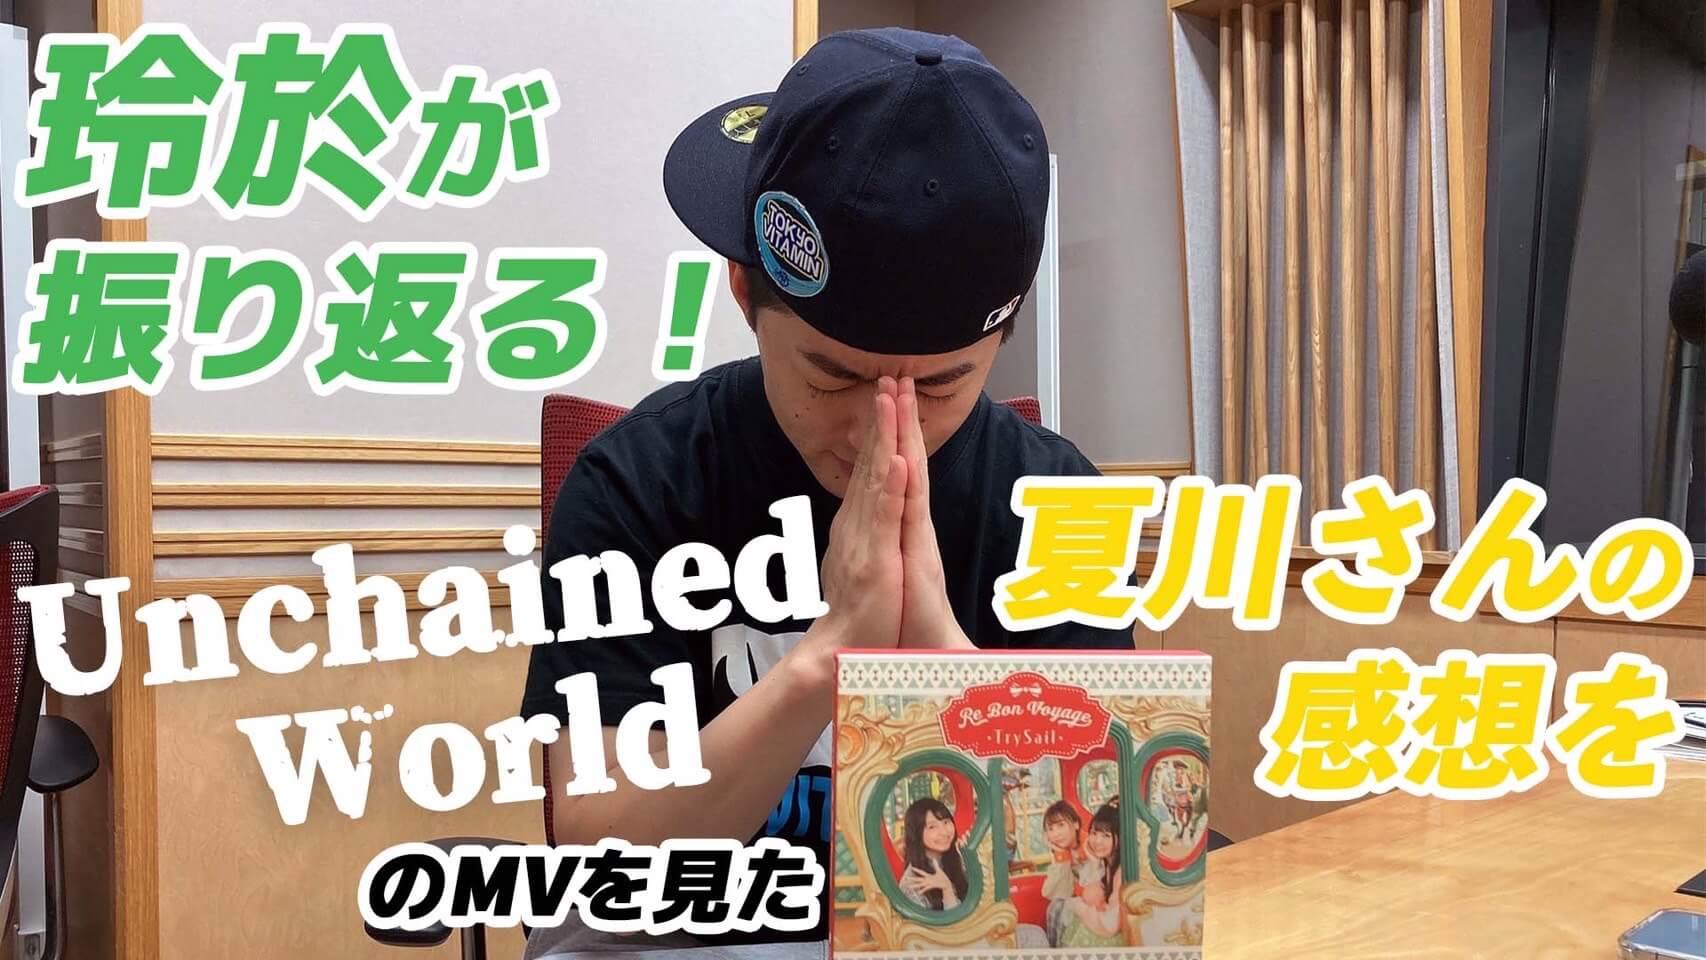 「Unchained World」のMVを見た夏川さんの感想を玲於が振り返る!